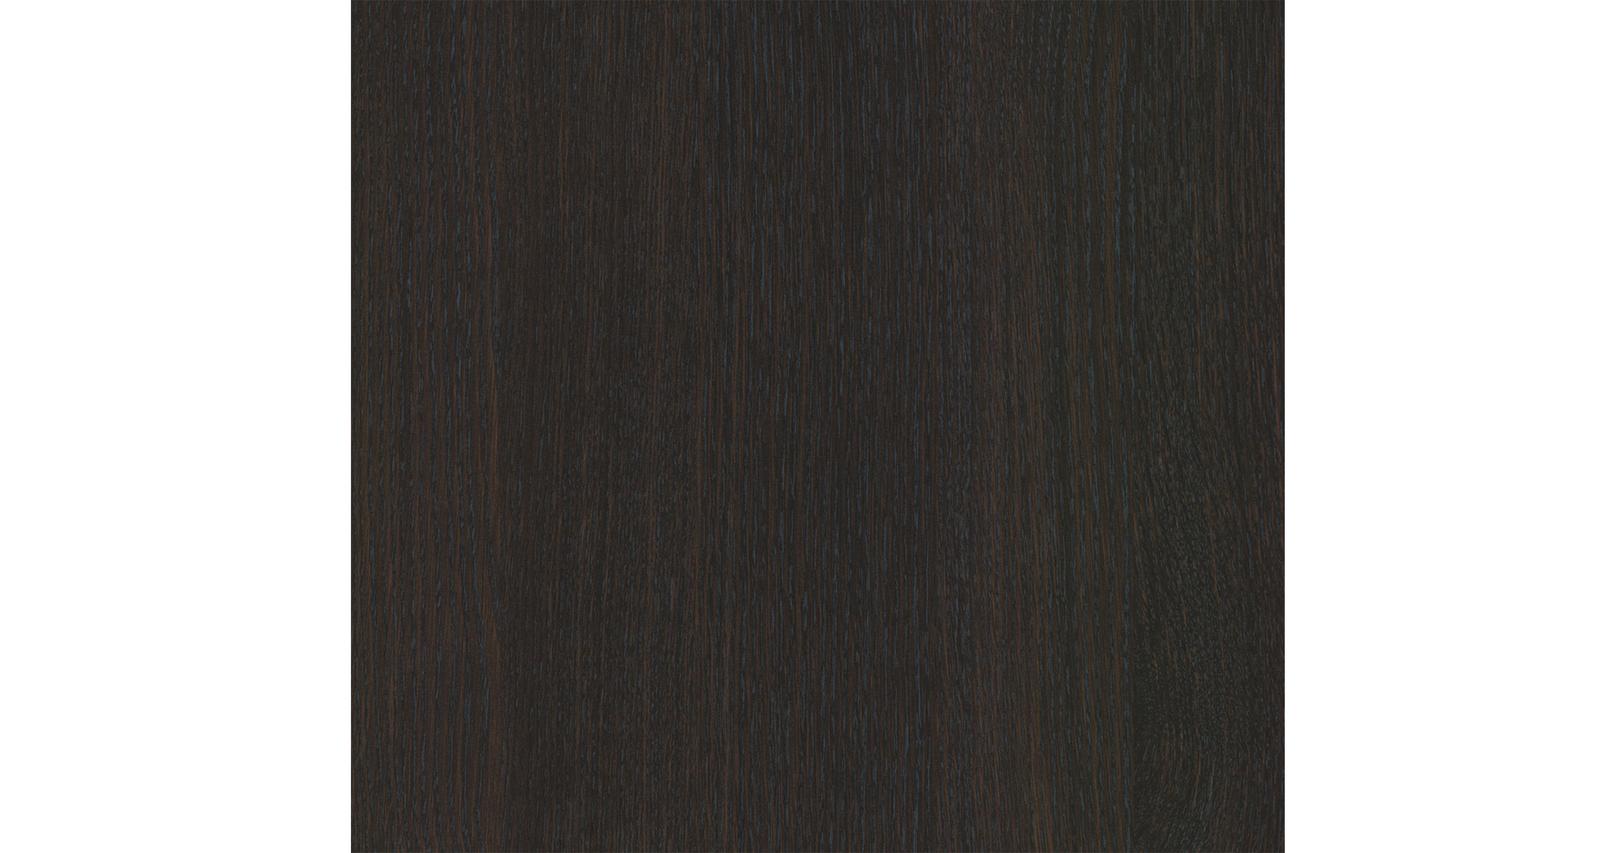 Шкаф-купе трехдверный Манчестер 205 см (дуб феррара+зеркало) от HomeMe.ru